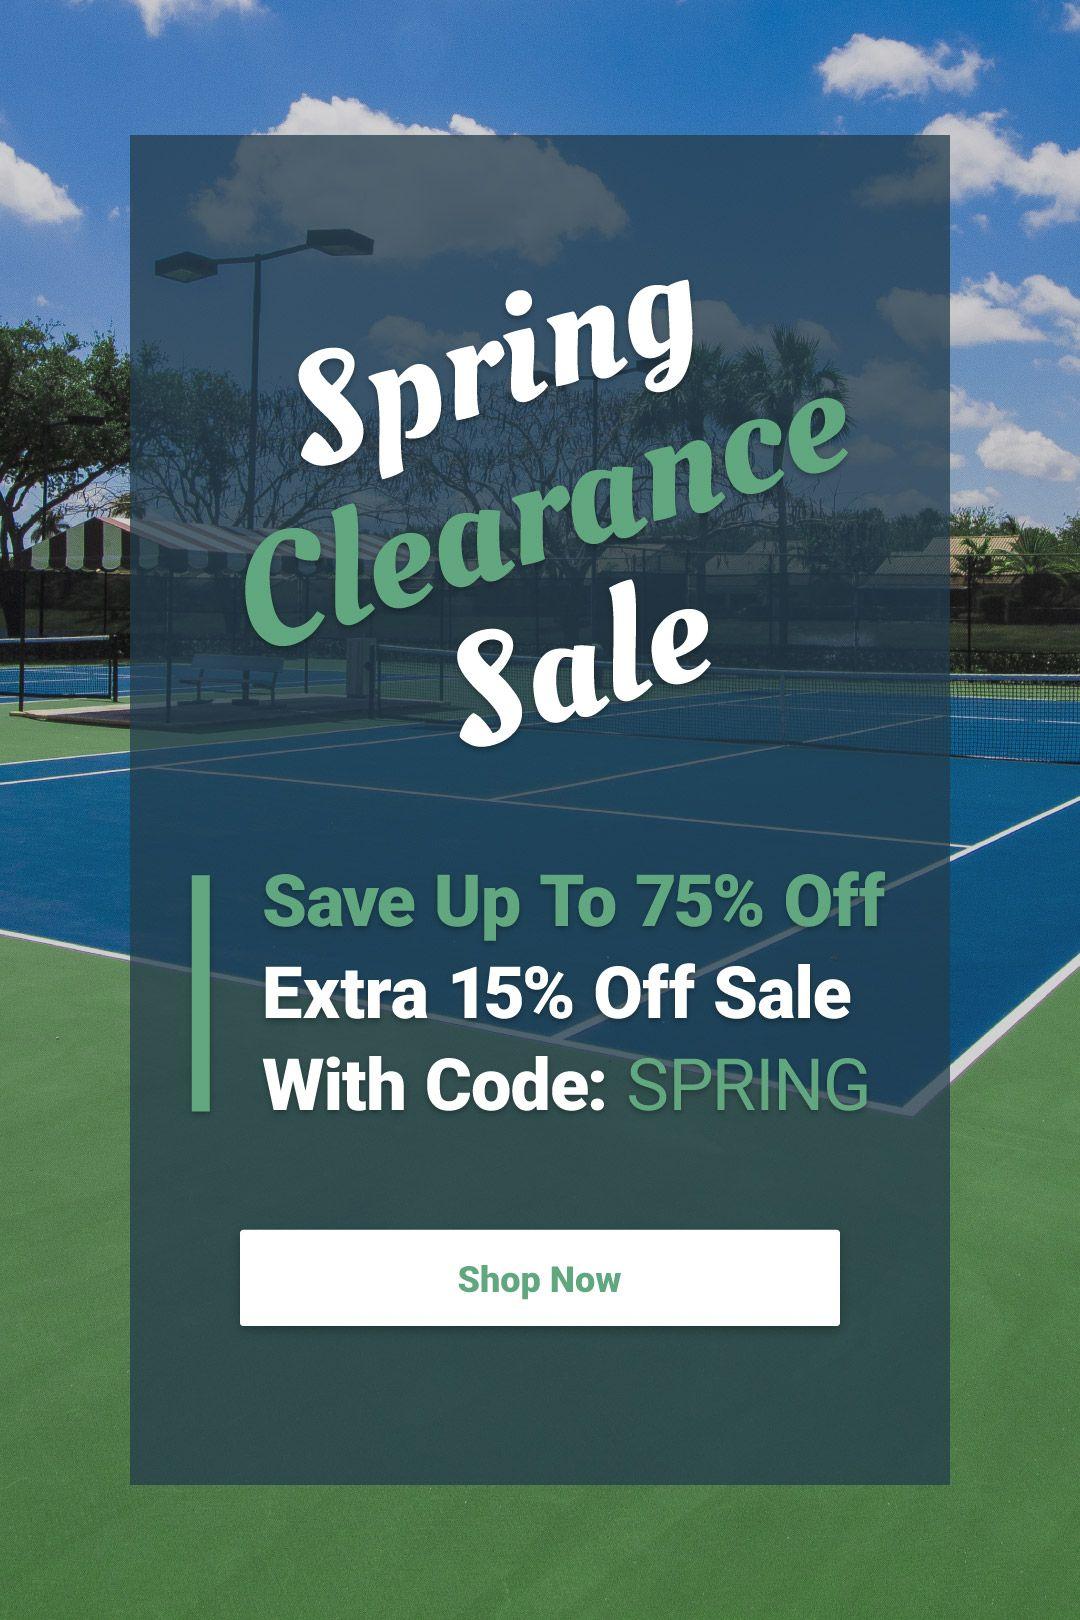 Tennis Clearance Sale